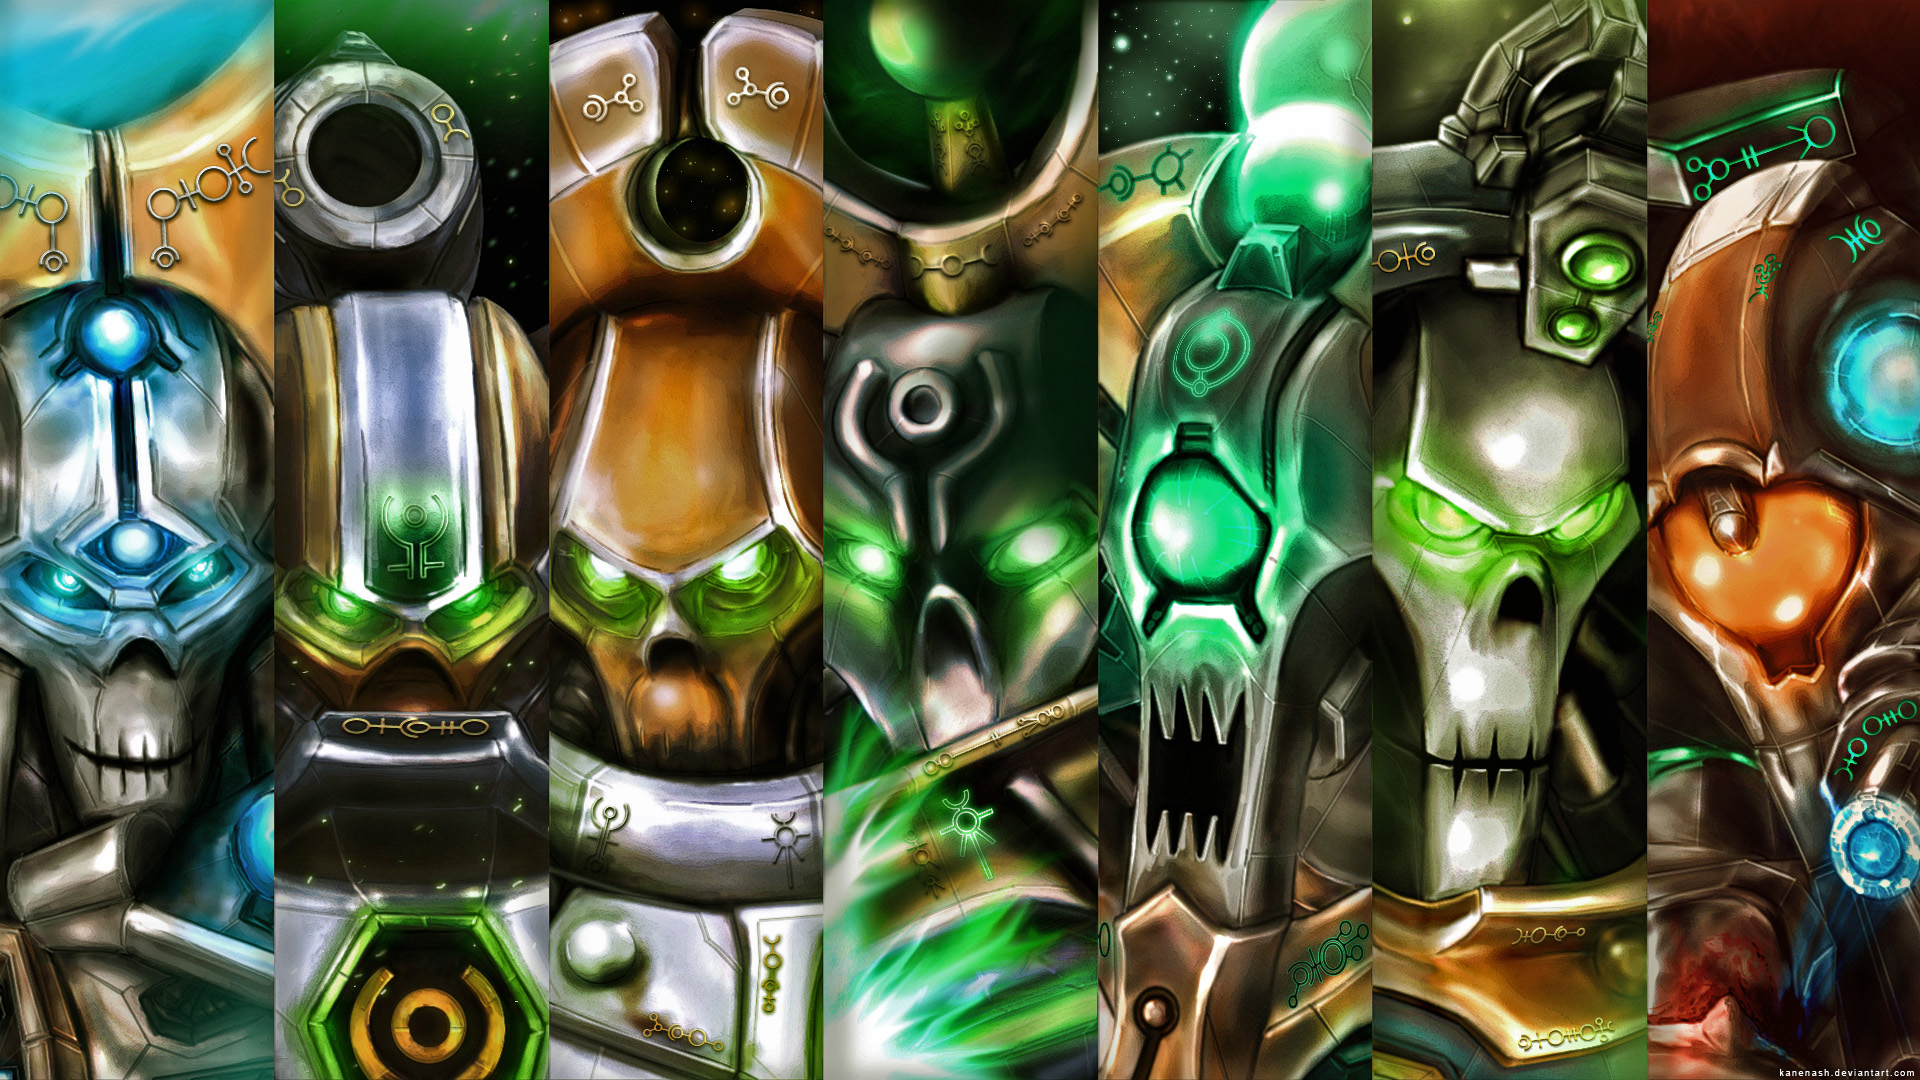 Necron characters